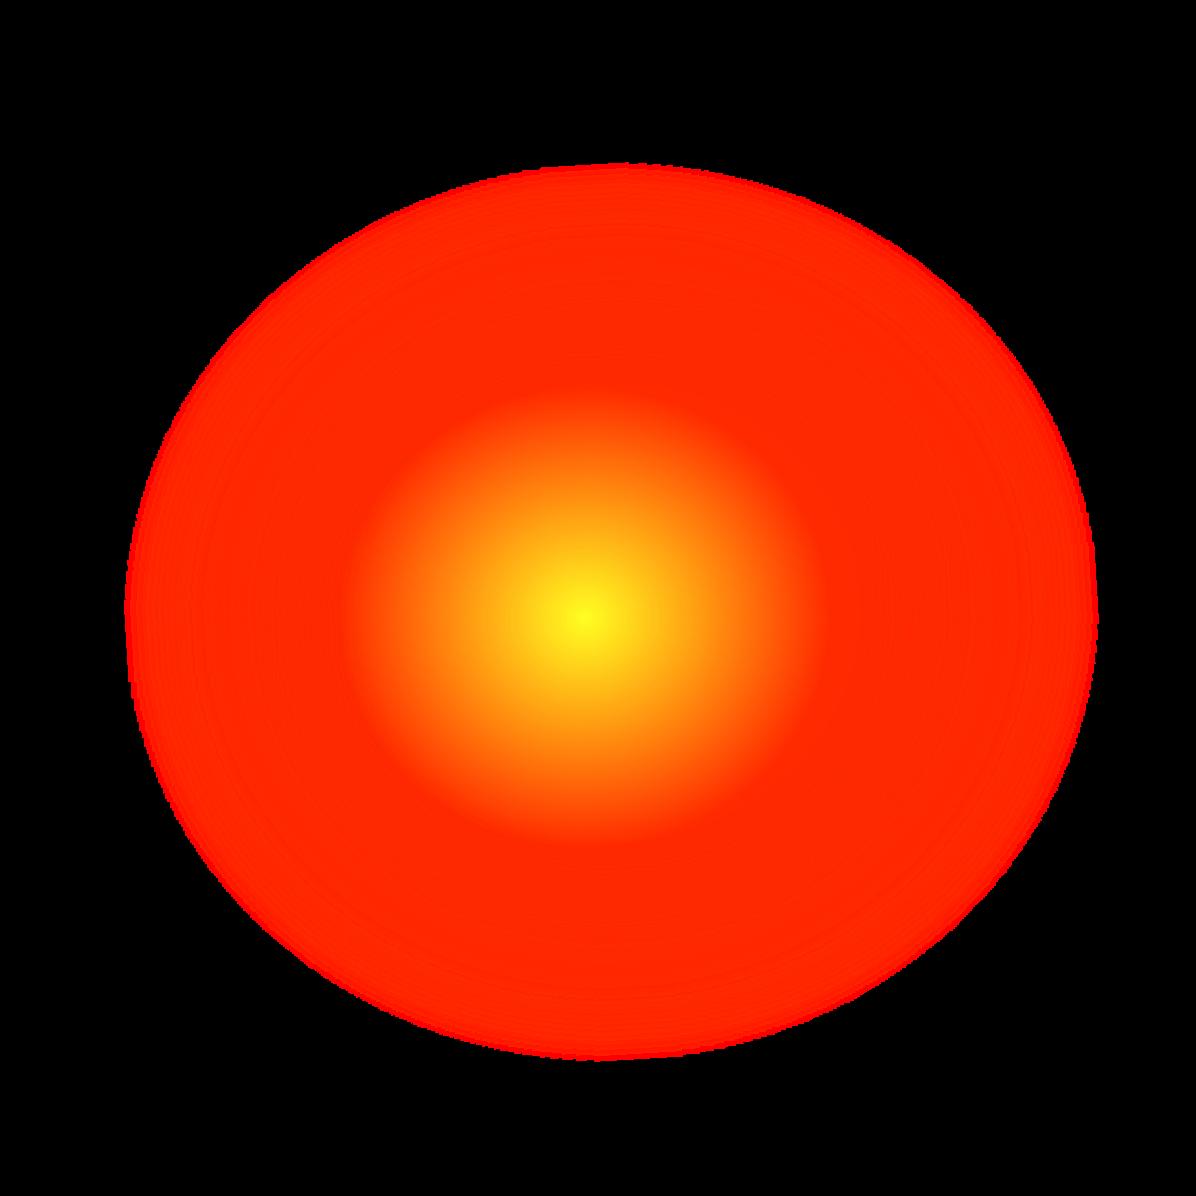 Pin By Low Ceiling Light Fixtures On Deco Png Mix Picsart Png Picsart Light Orange